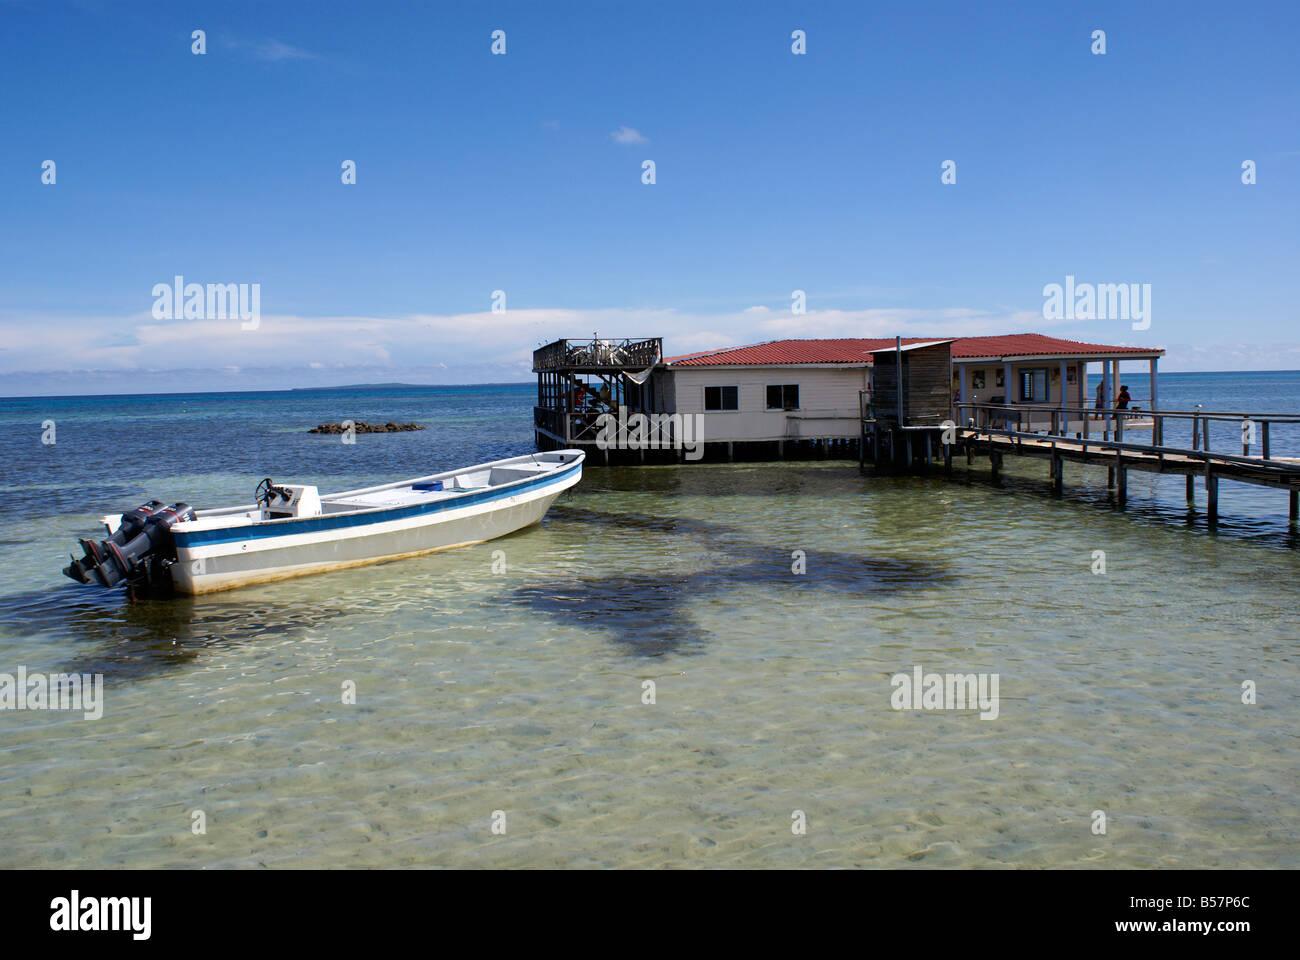 Anastasia's restaurant and Bar on Big Corn Island, Nicaragua, Central America Stock Photo